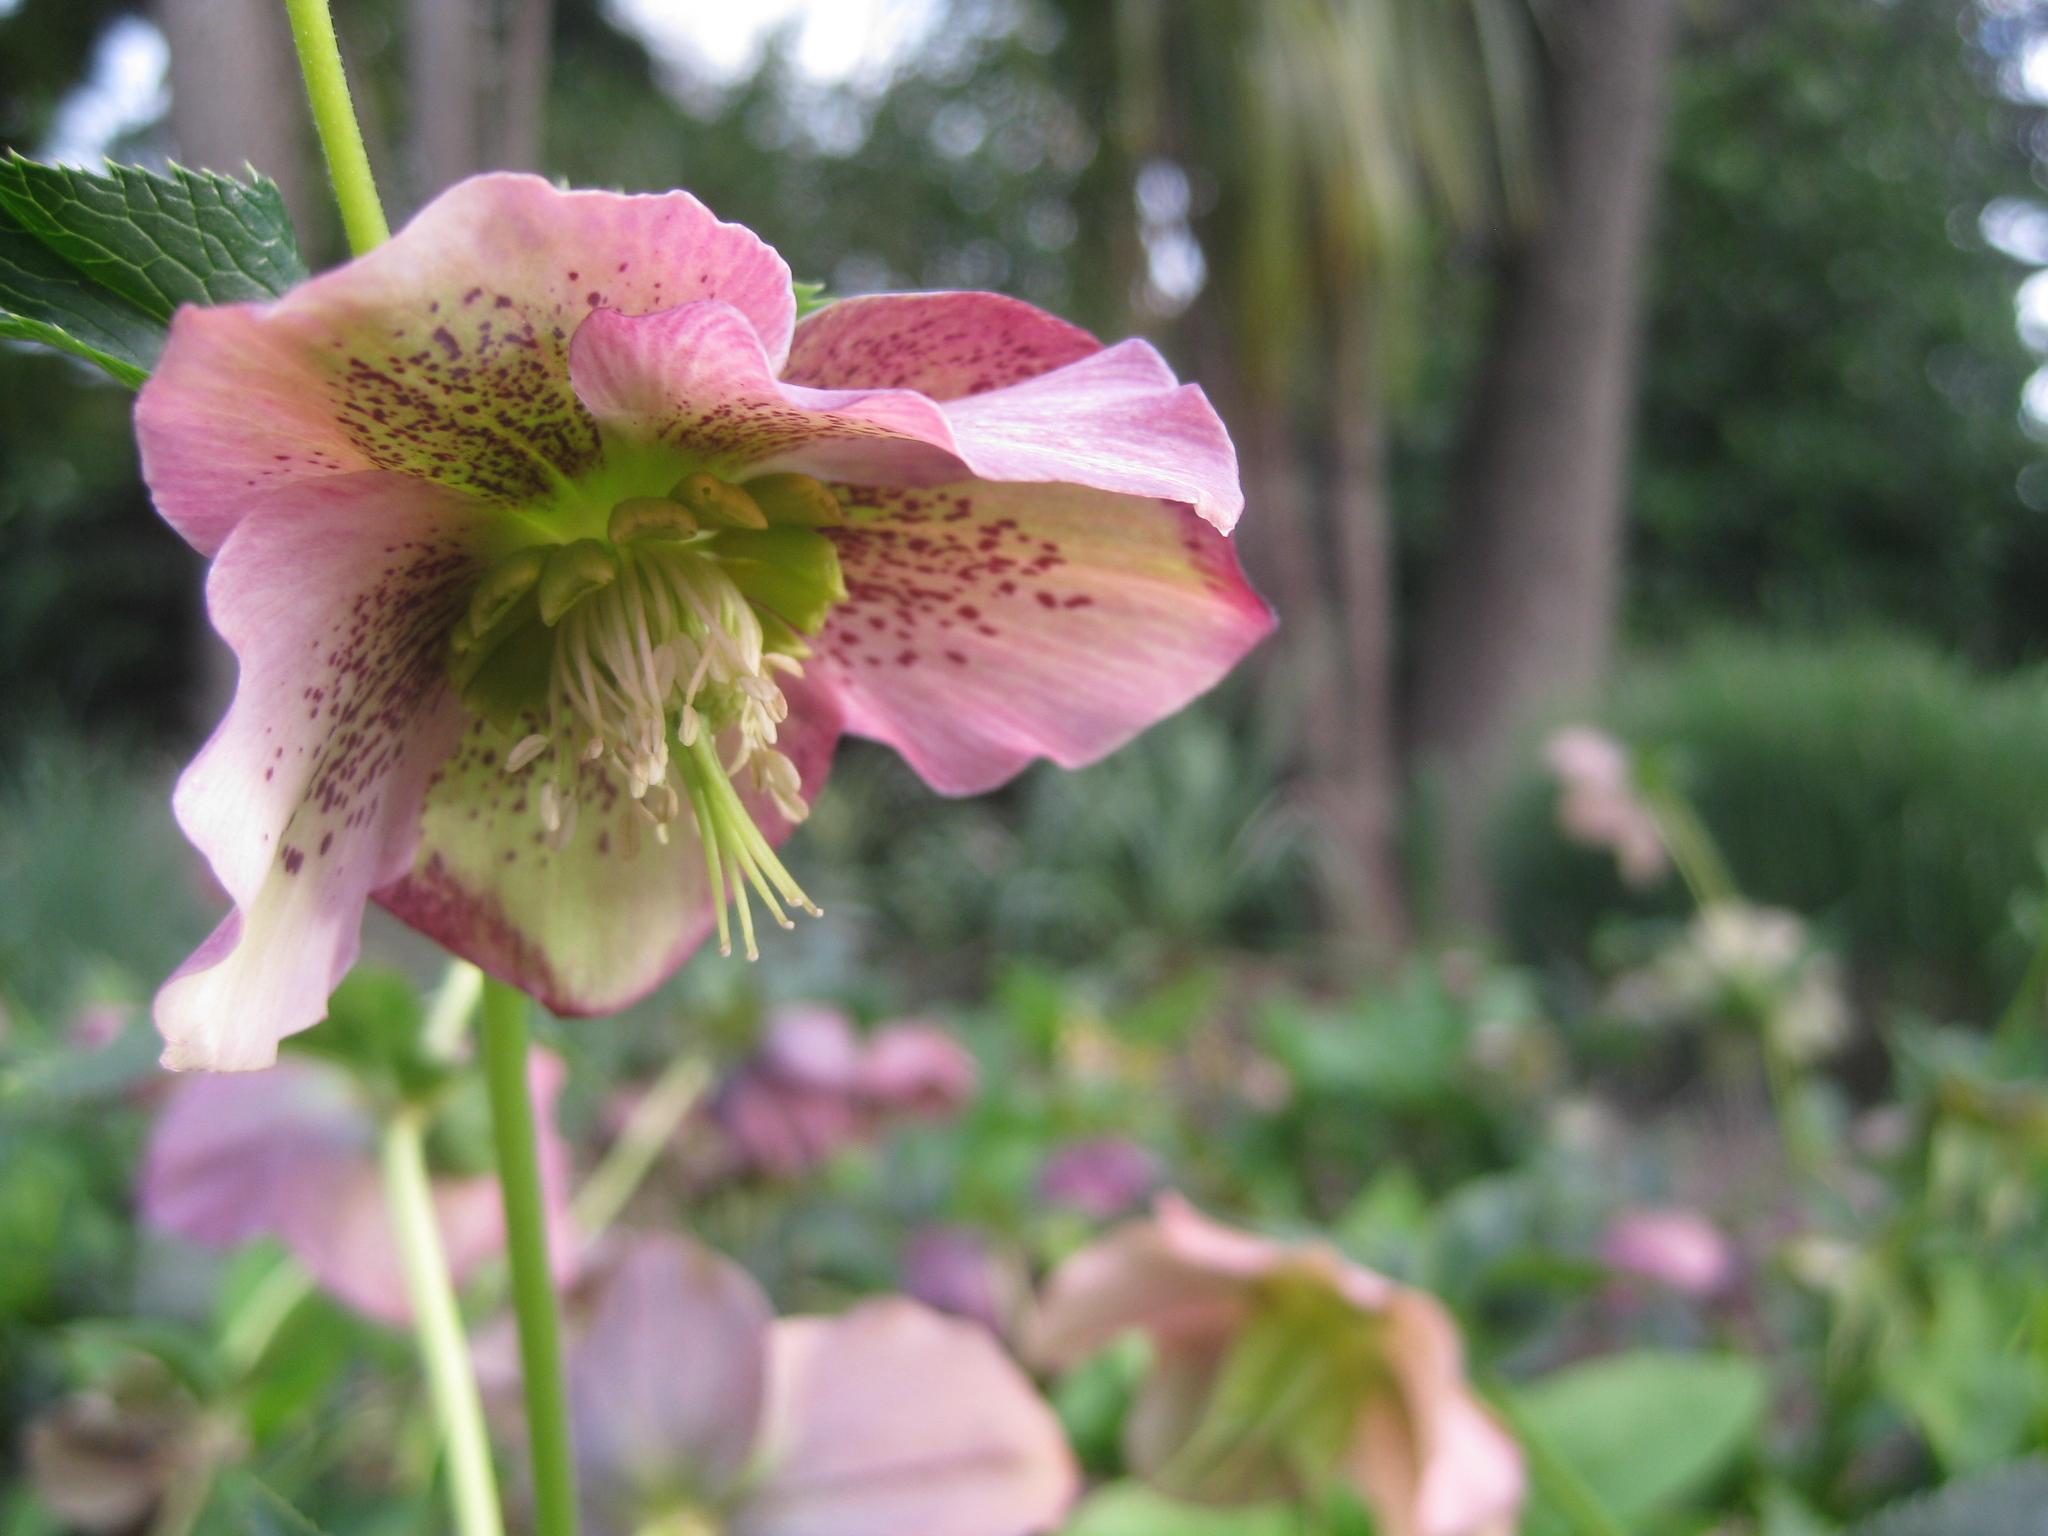 pink flower treasury gardens melbourne sacred ordinary poem Talitha Fraser